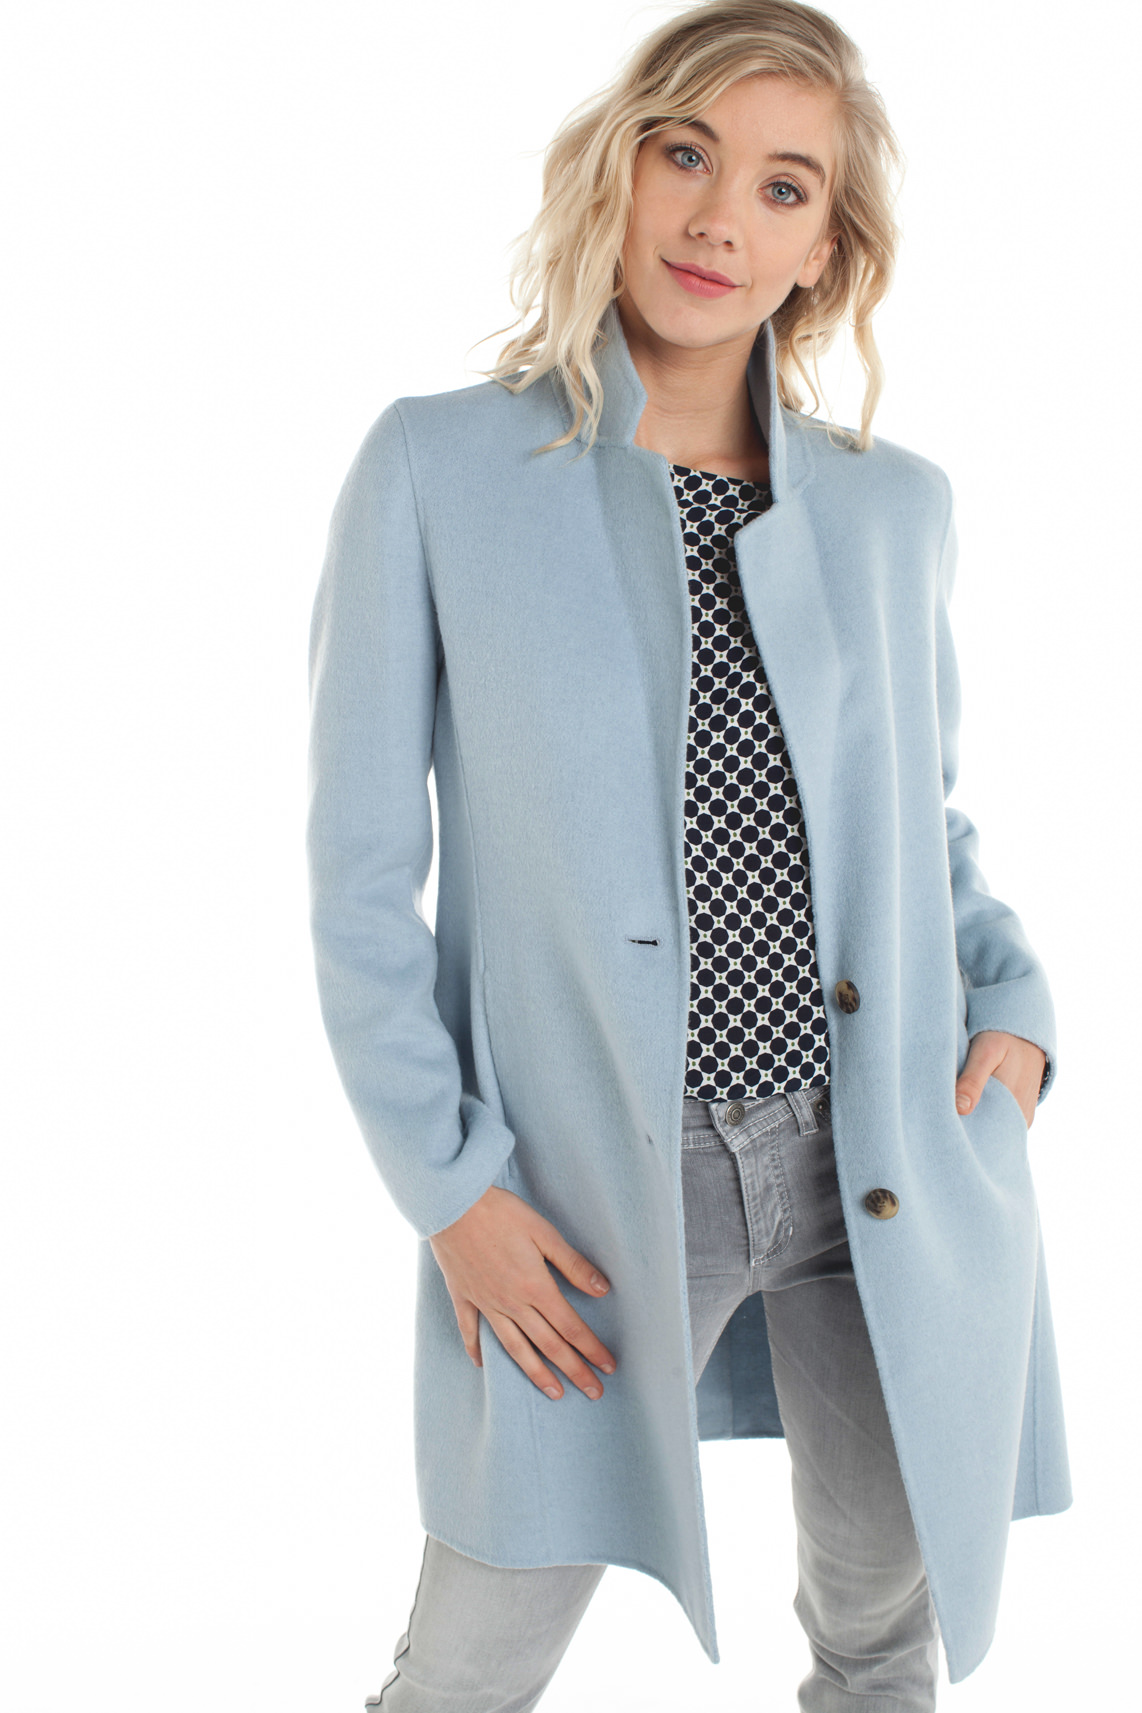 Nieuw Beaumont Dames Lange wolmix mantel Blauw | Jassenboutique SK-75